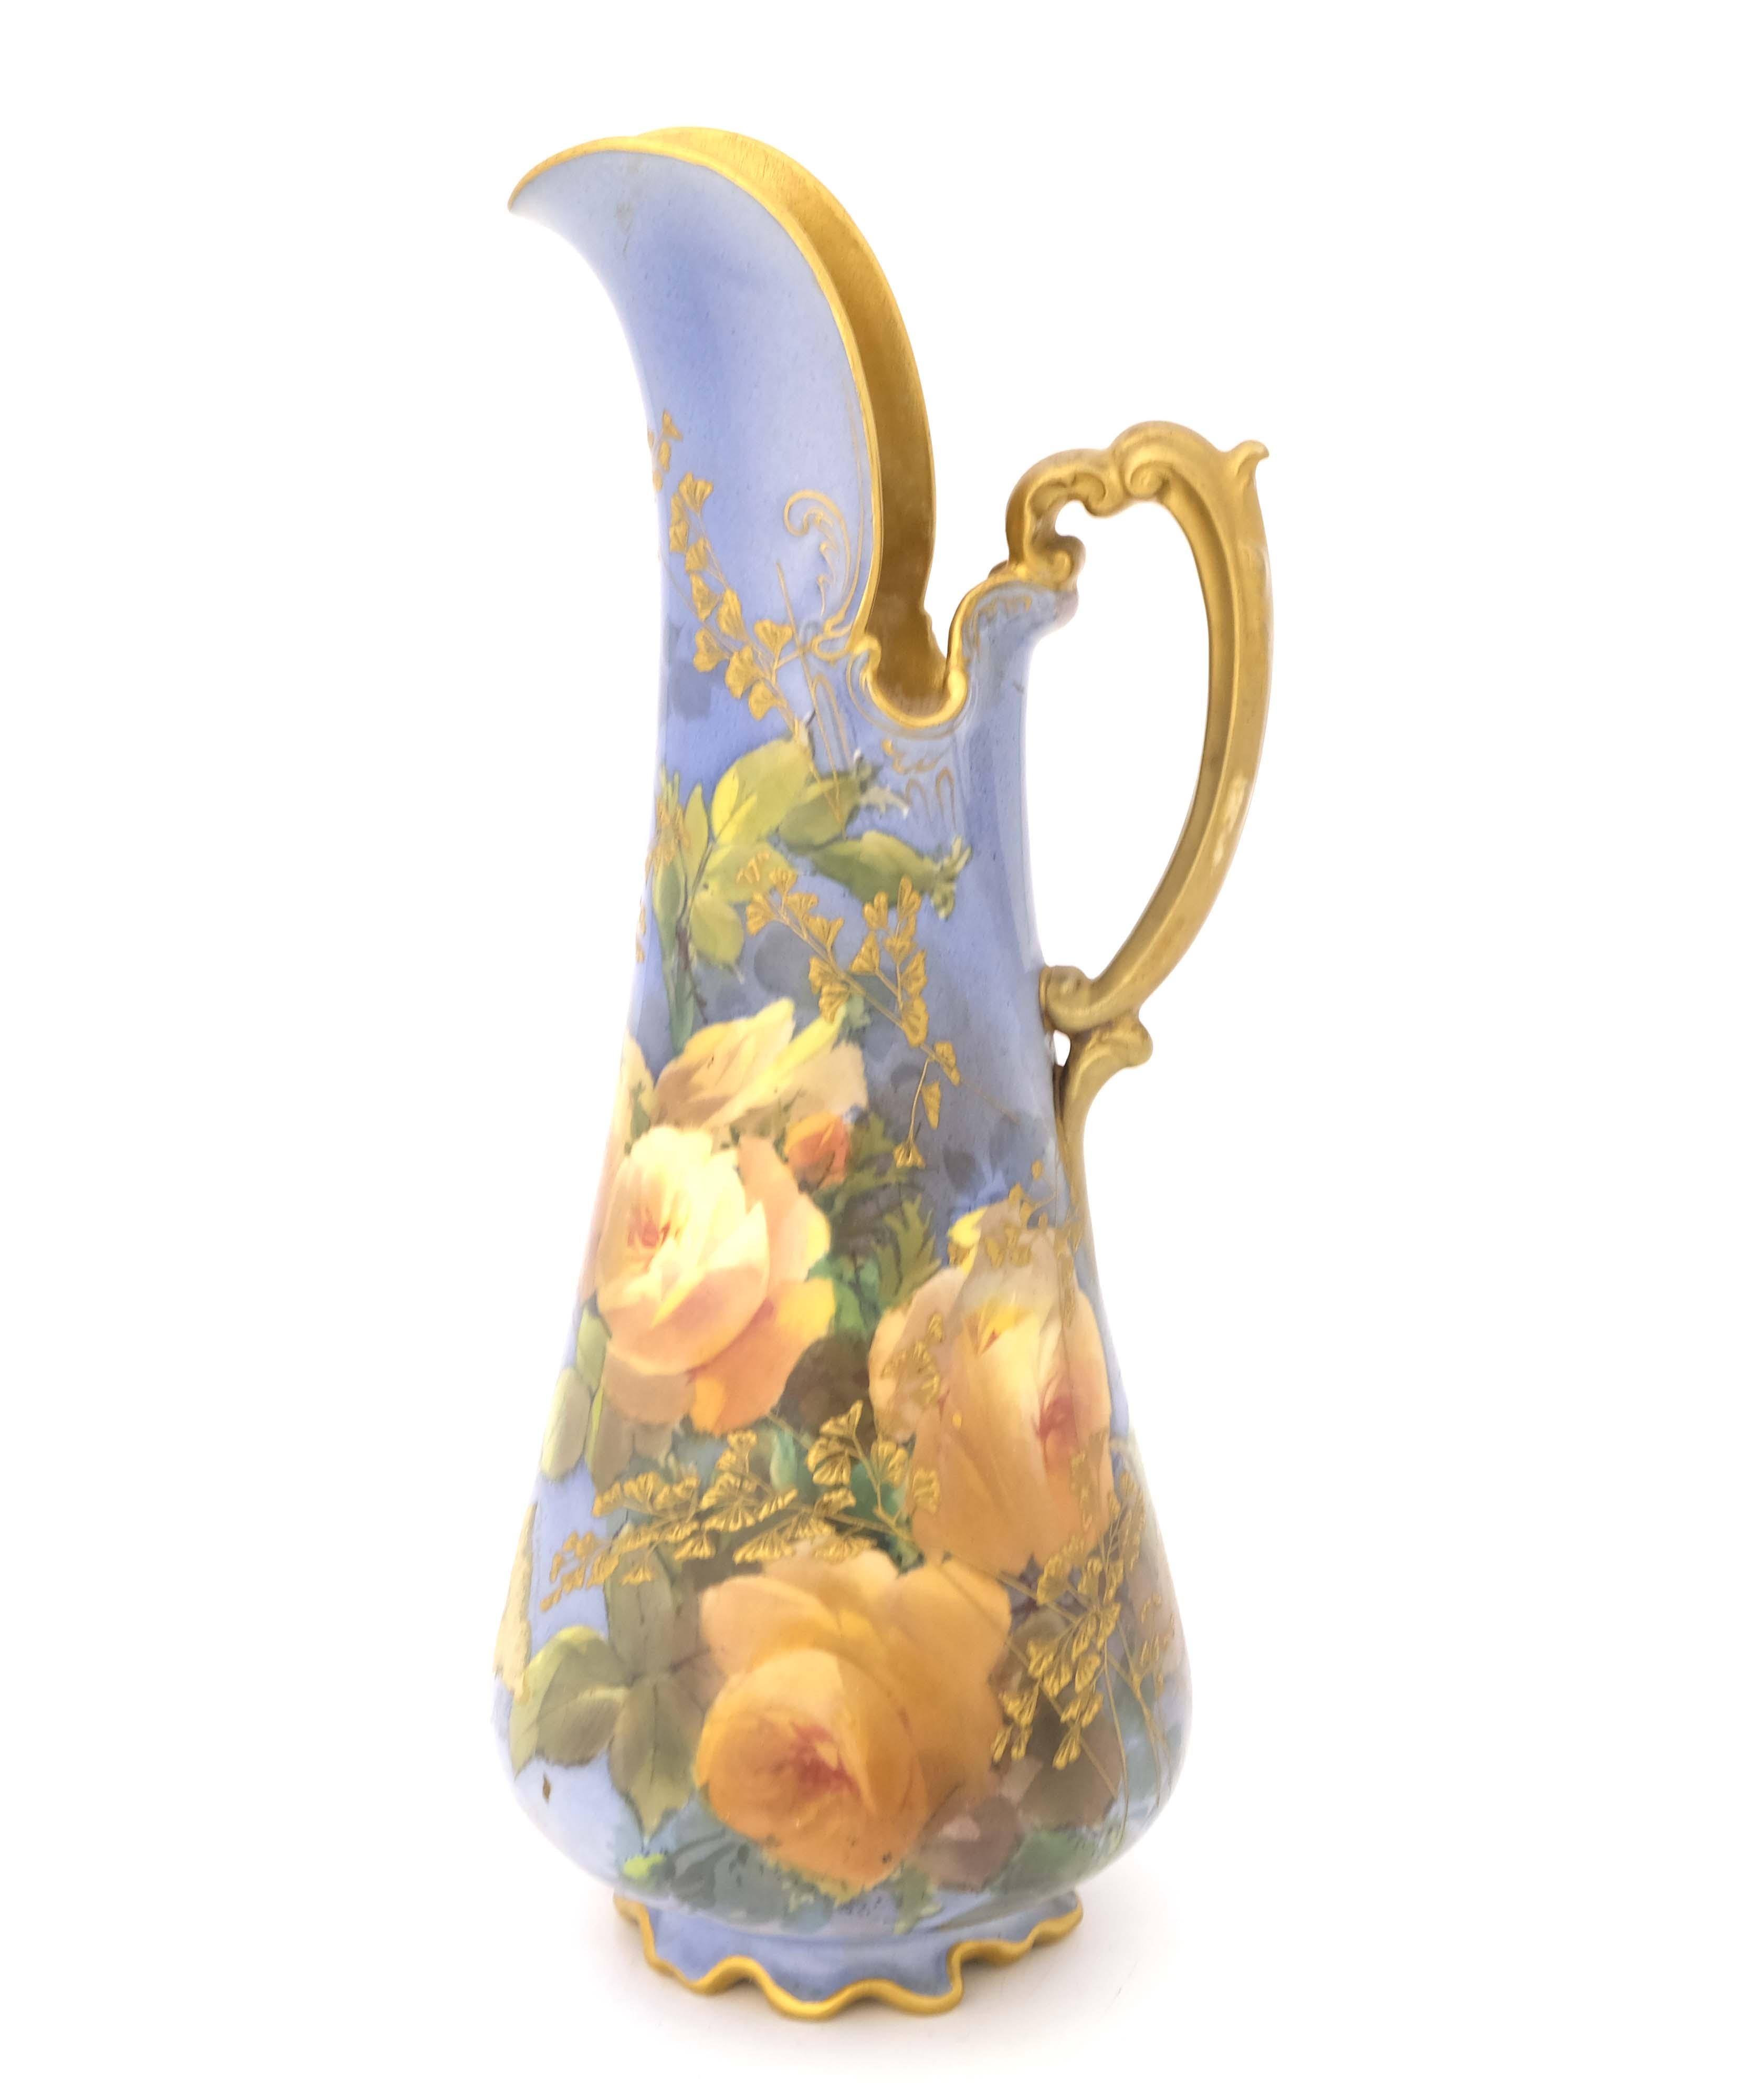 Leonard Bentley for Doulton Burslem, a rose painte - Image 3 of 6